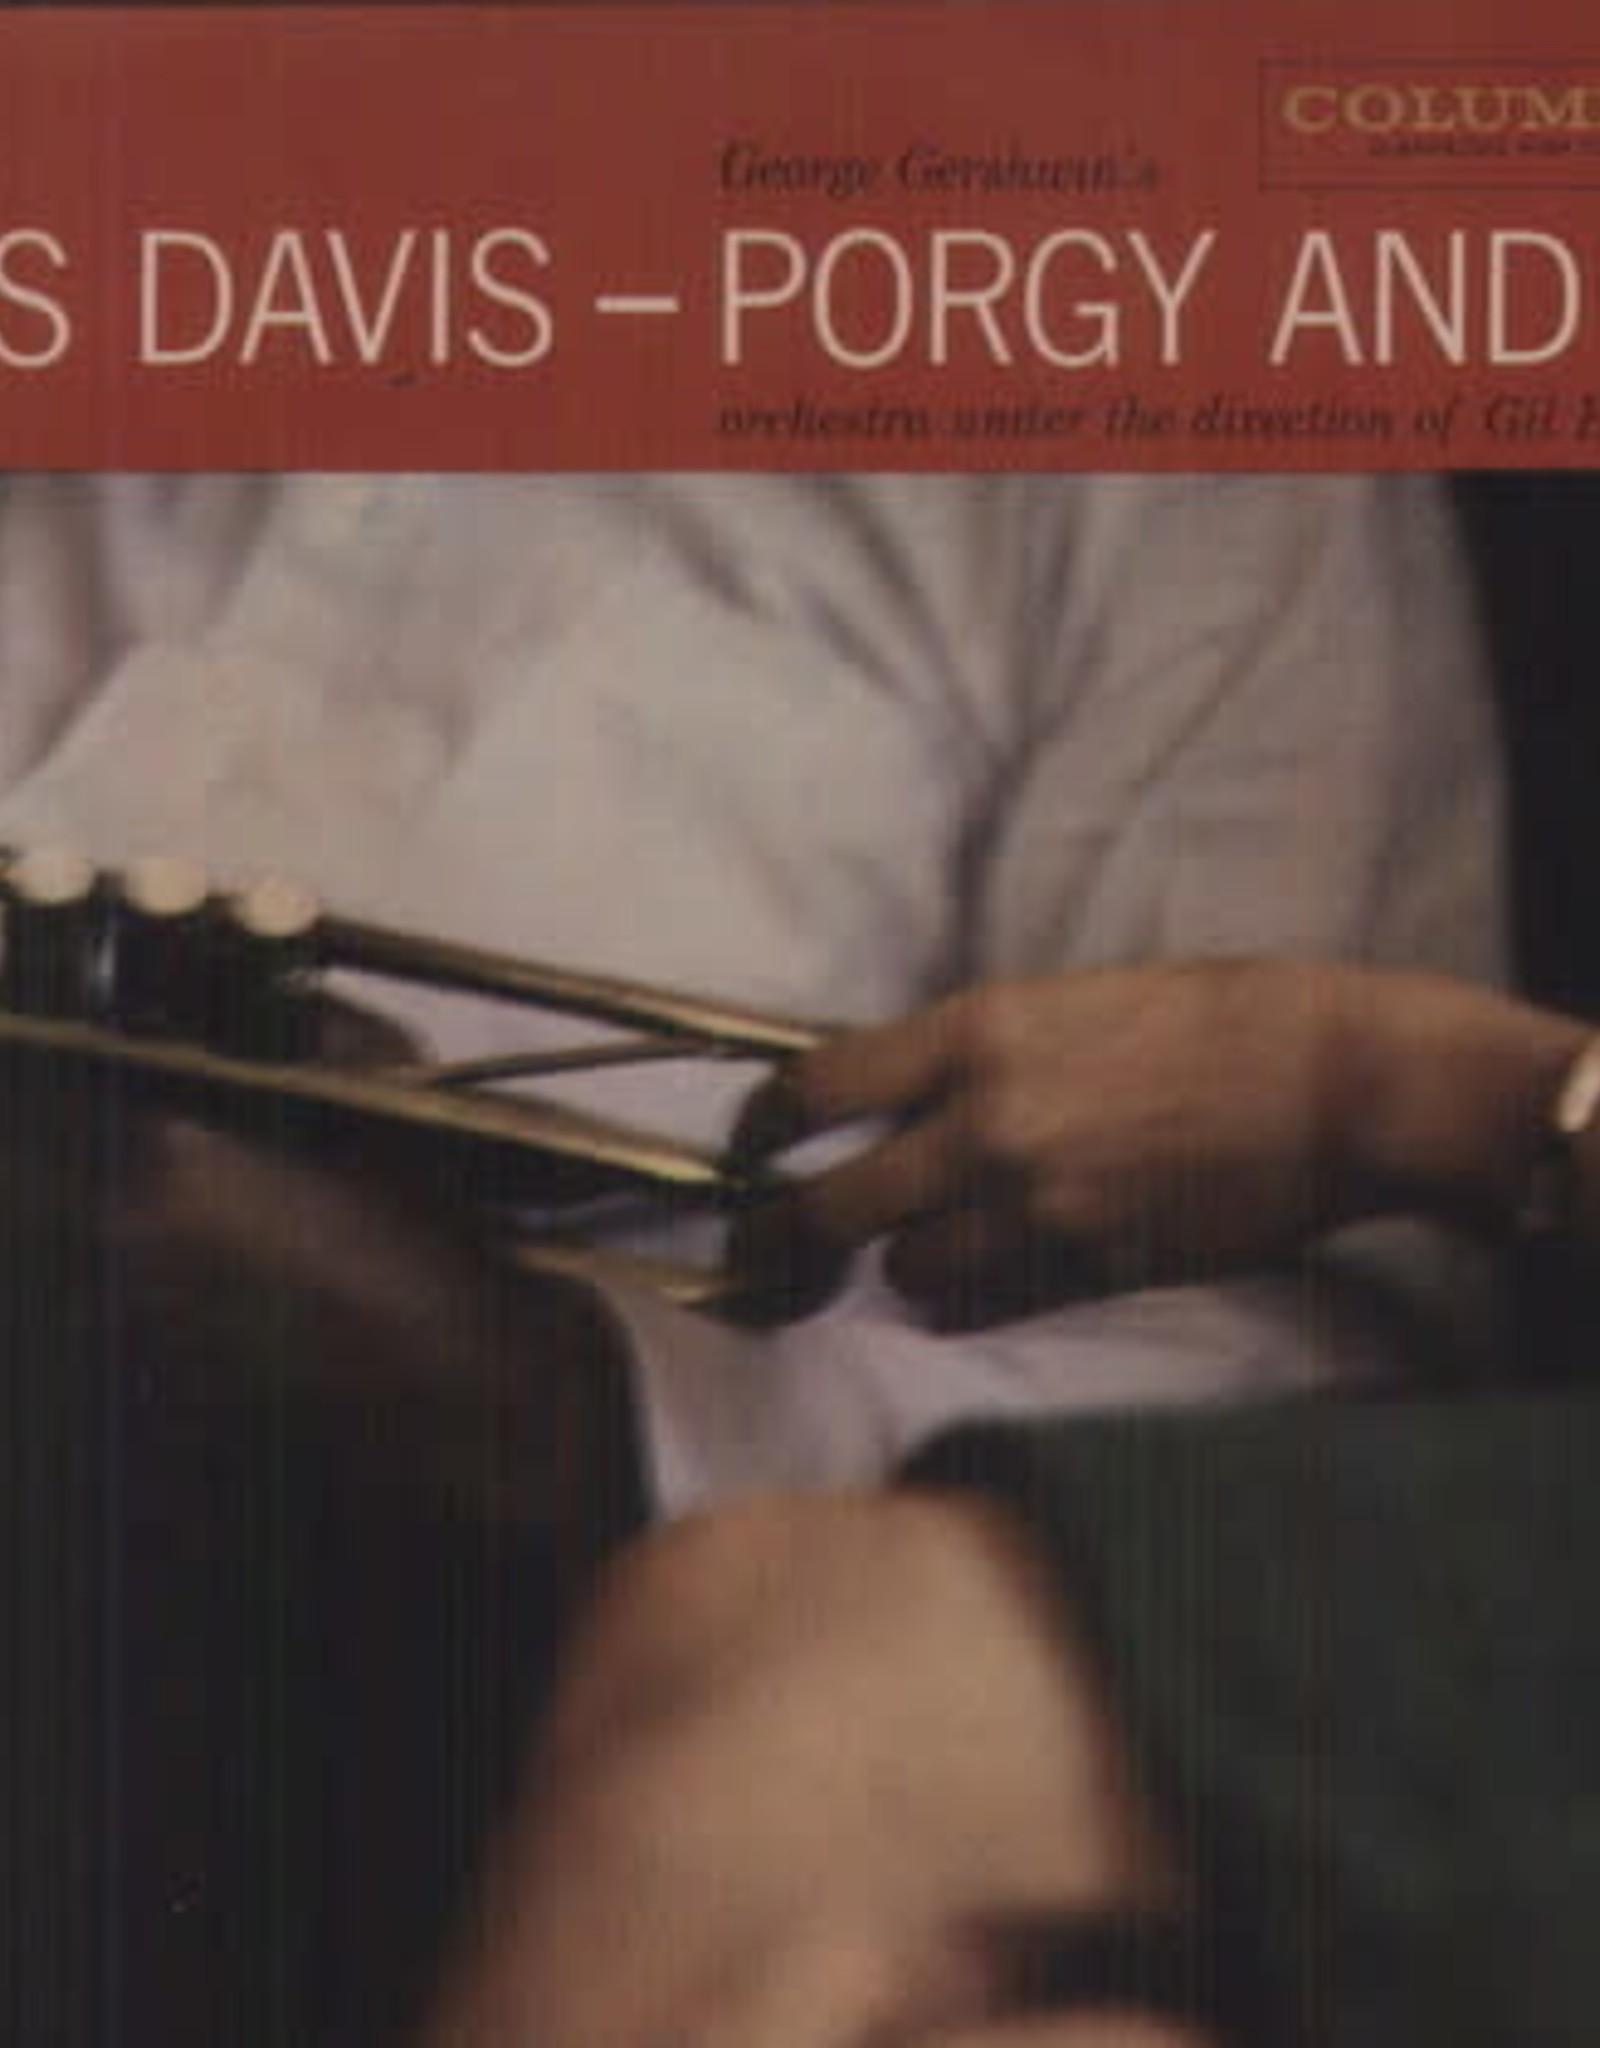 Miles Davis - Porgy and Bess [Mono]